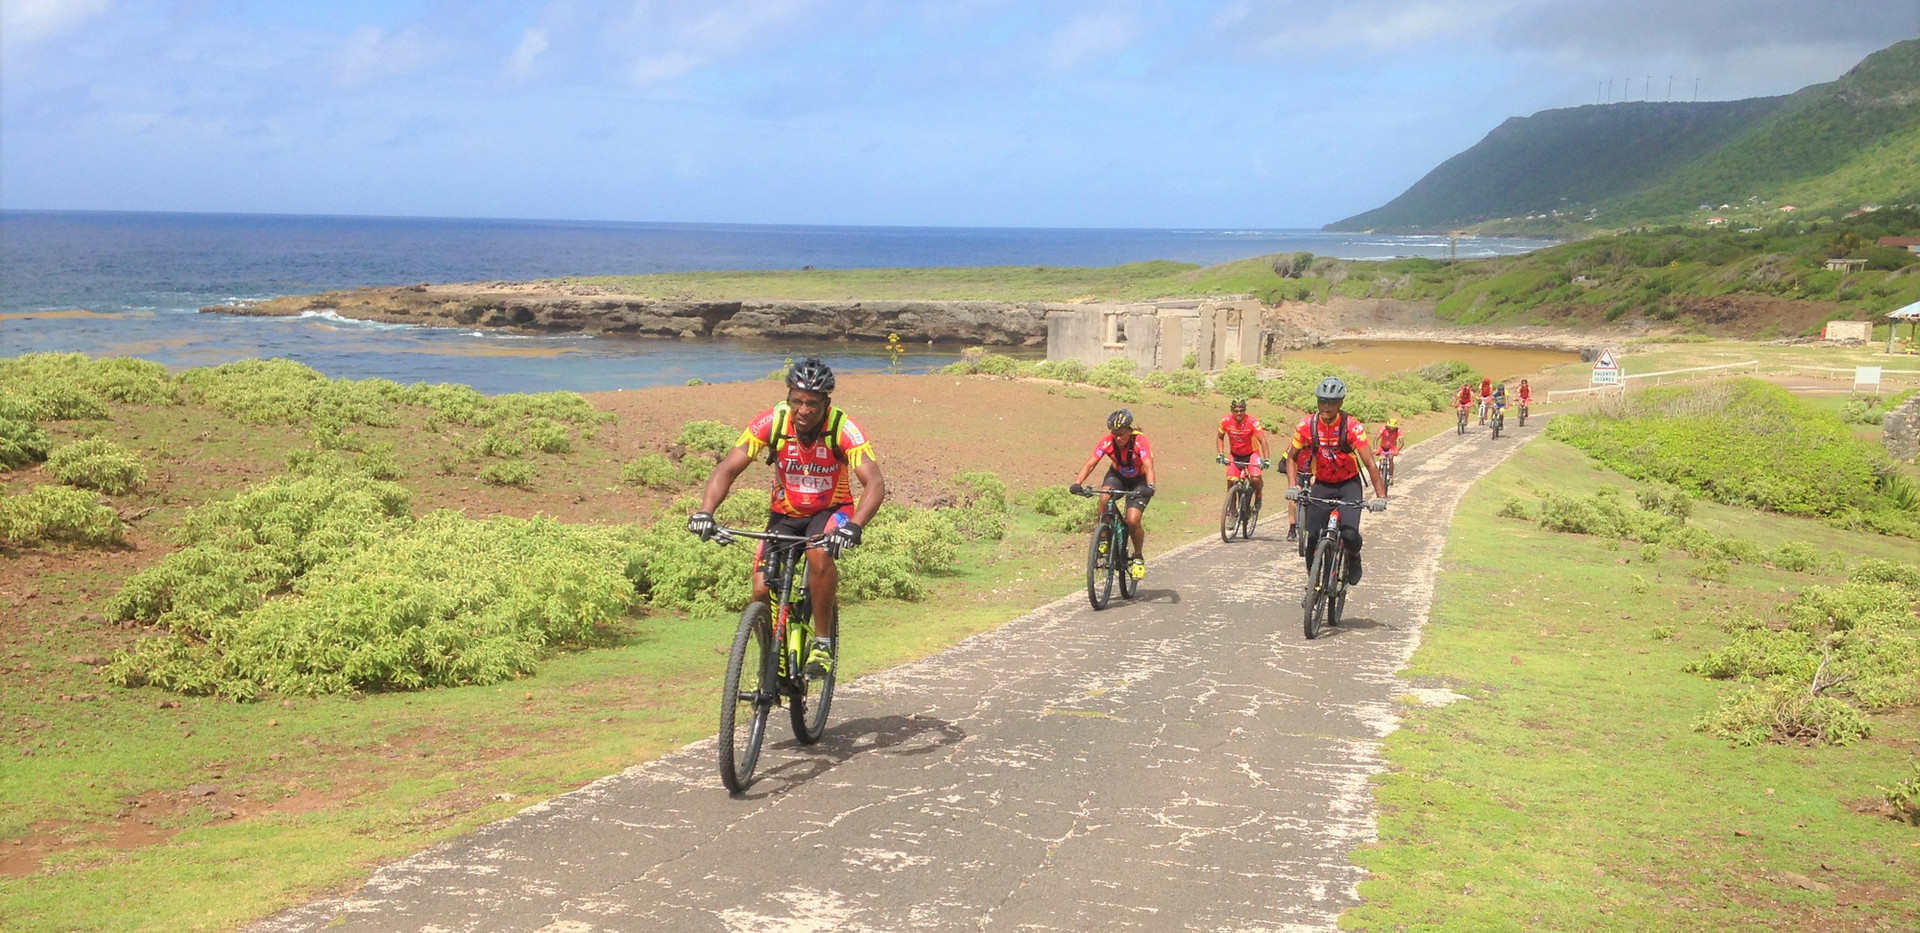 Le Madiniana Bikers (Martinique)